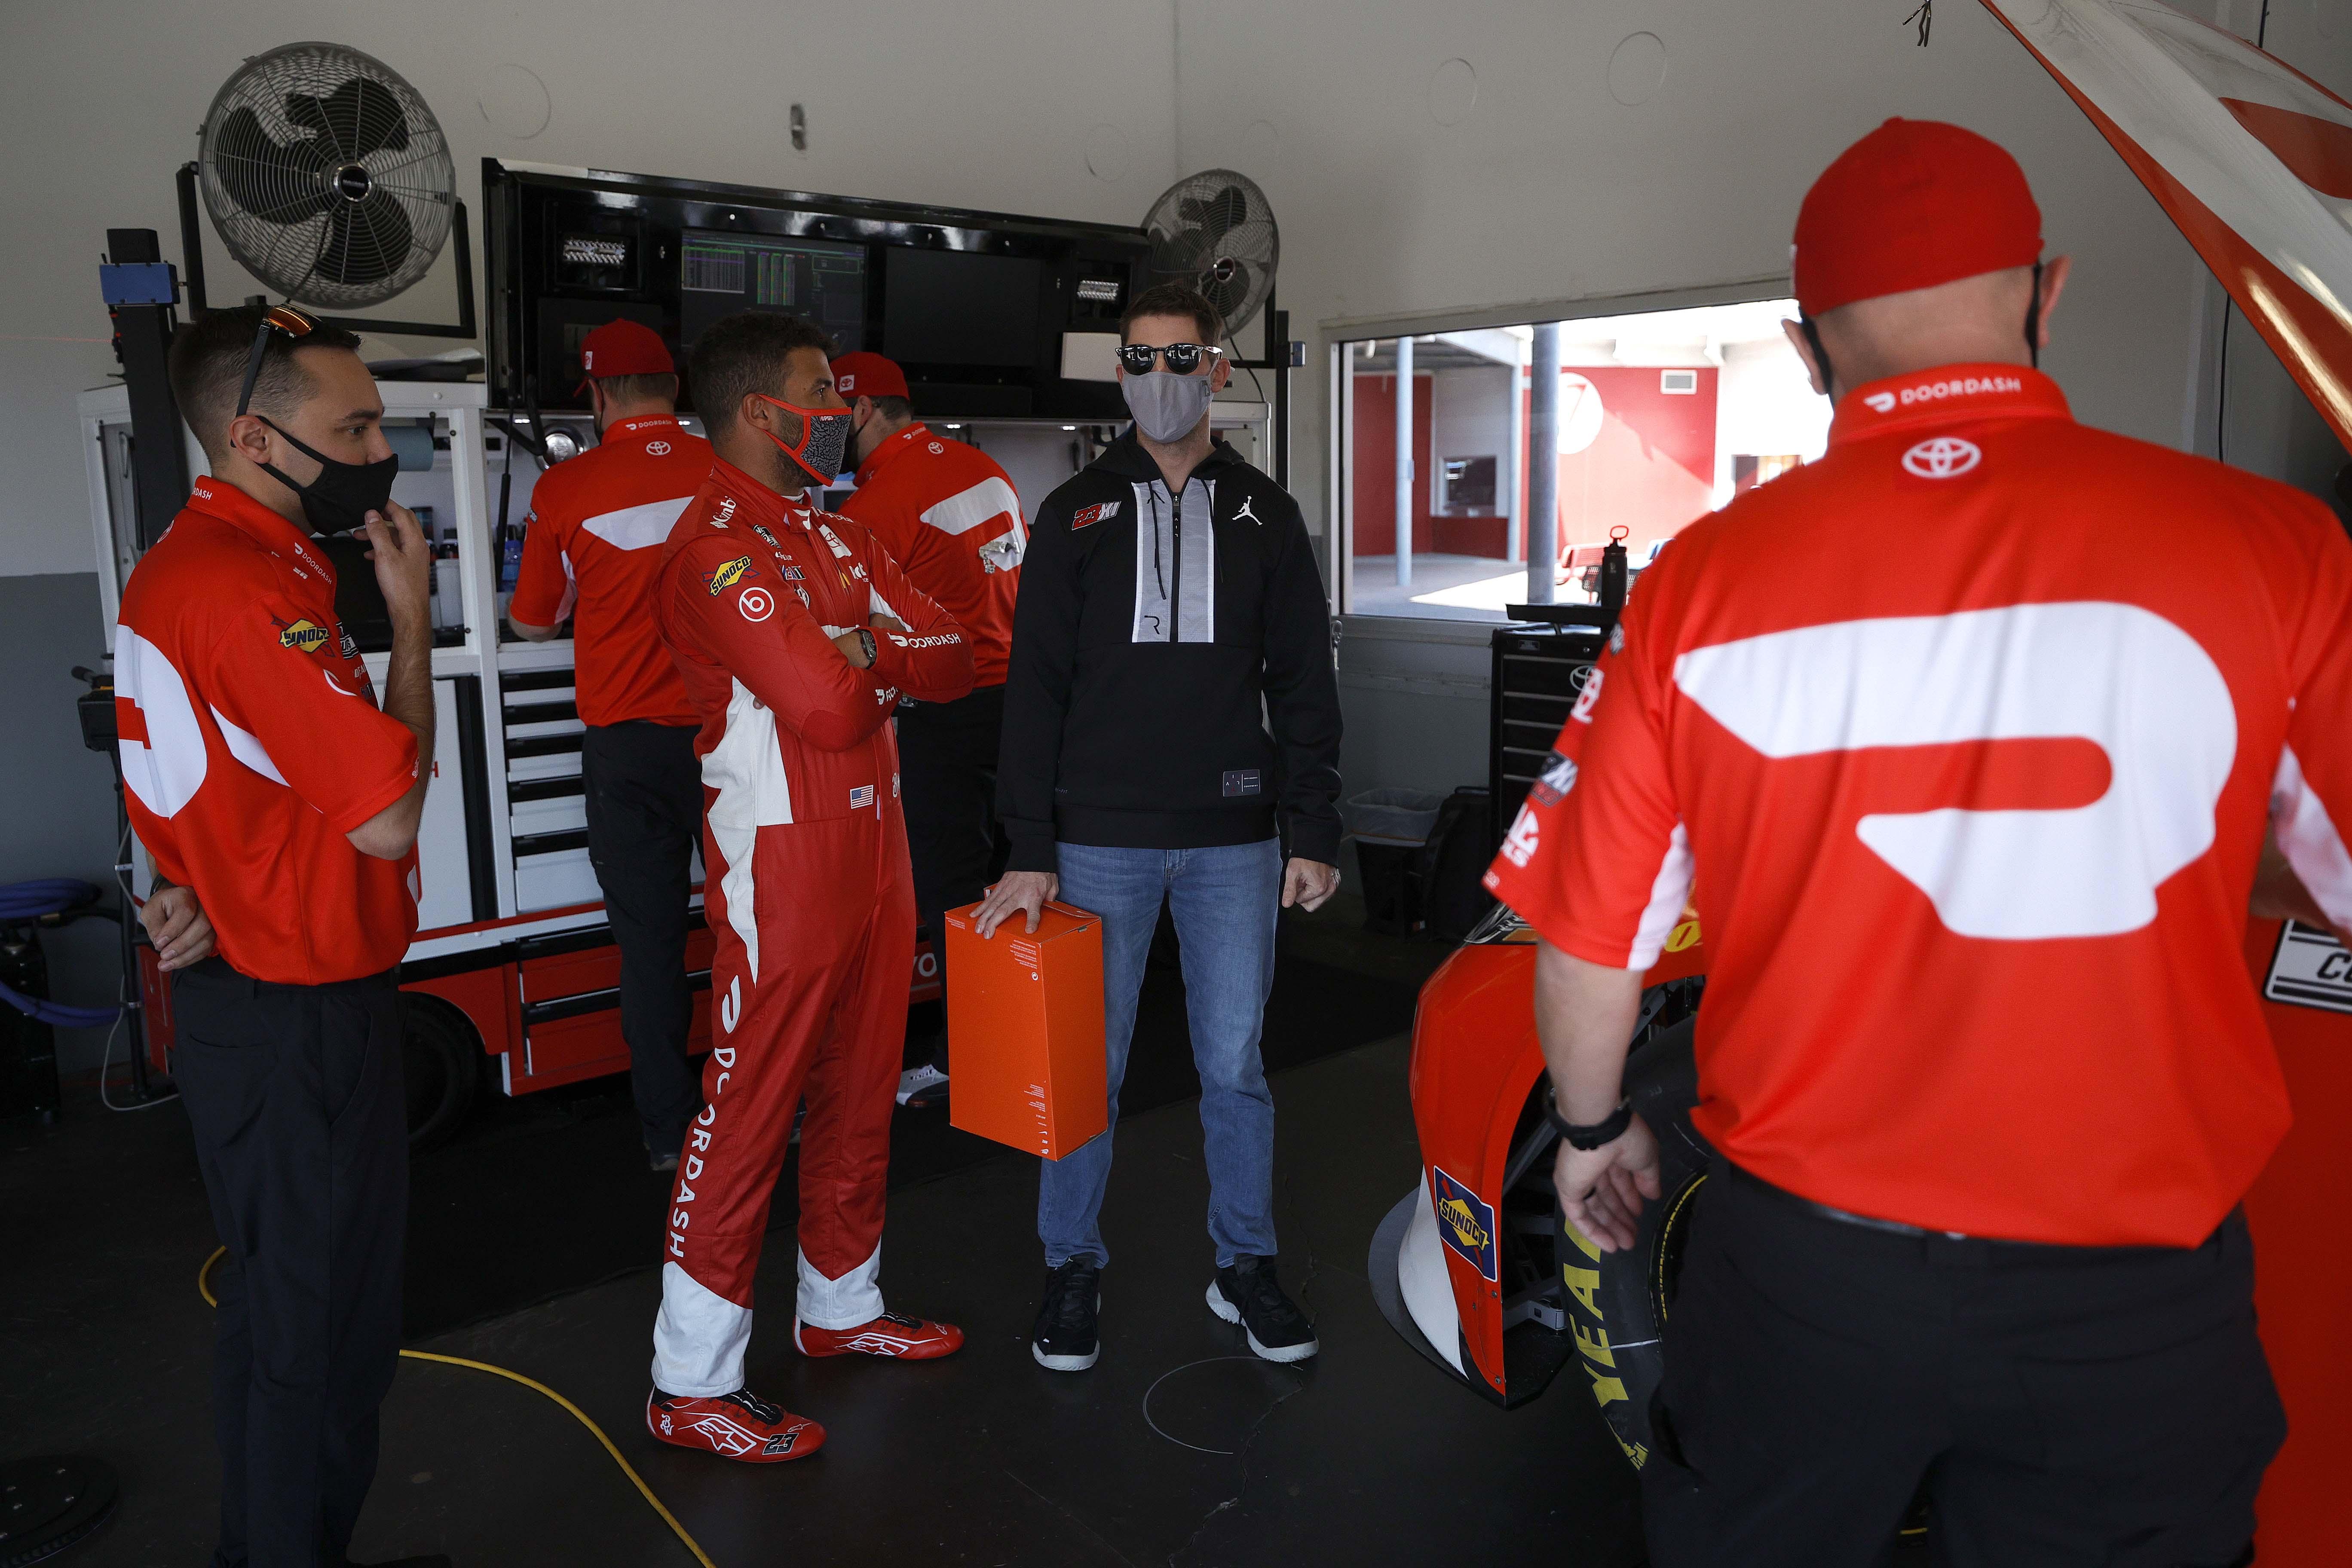 Denny Hamlin and Bubba Wallace - 23XI Racing - Daytona International Speedway - NASCAR Cup Series